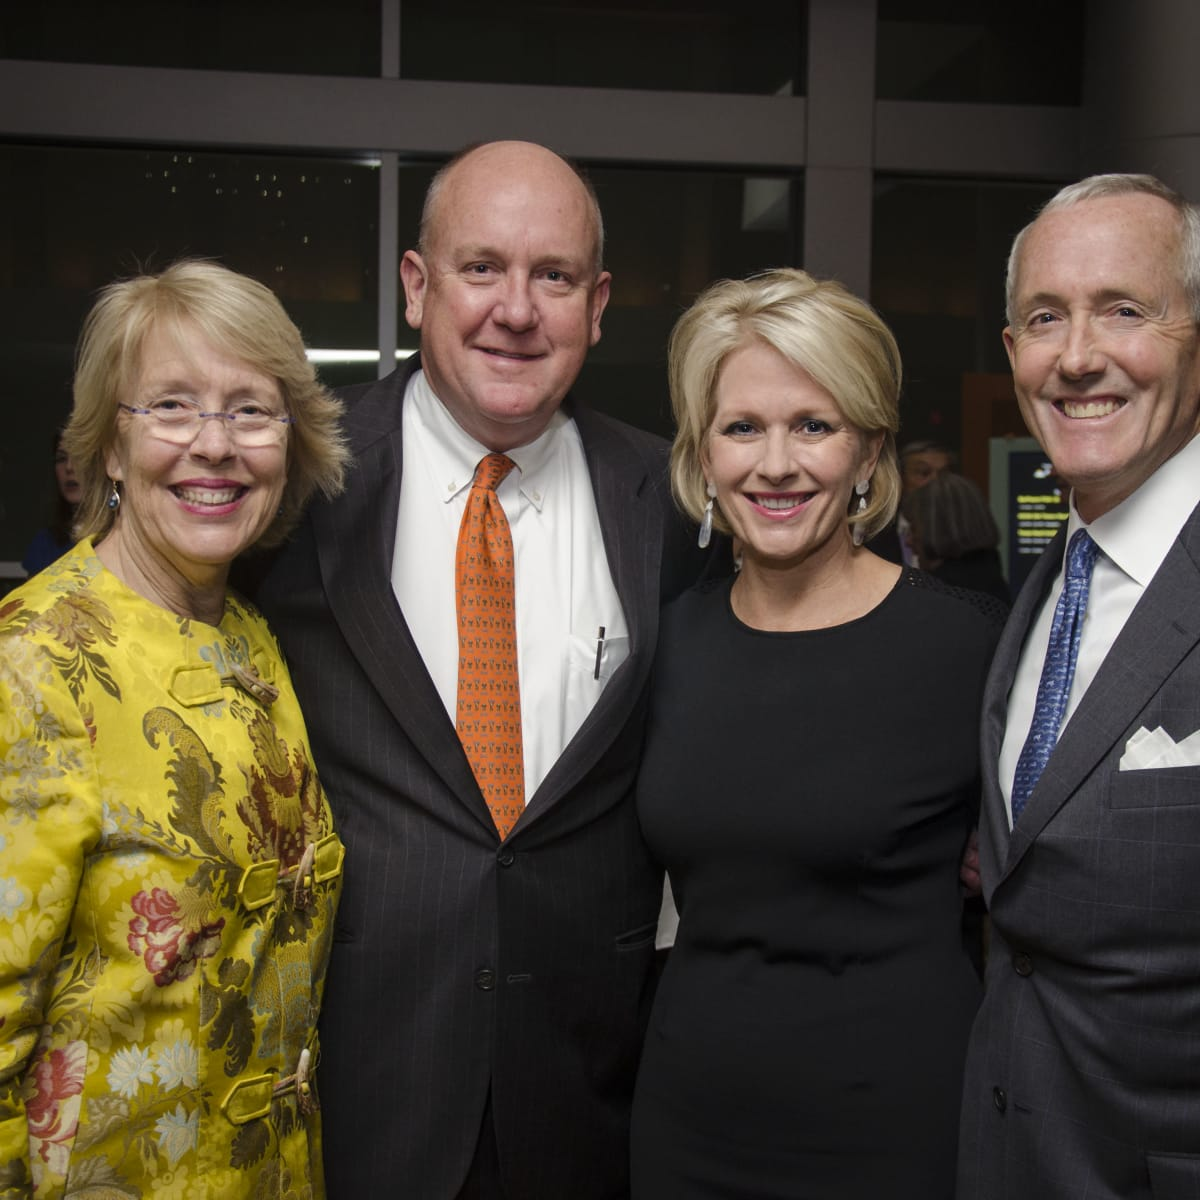 Texas Heart Institute dinner, Feb. 2016, Susan Cooley, Dr. Charles Fraser, Helen Fraser, Dr. John Craddock